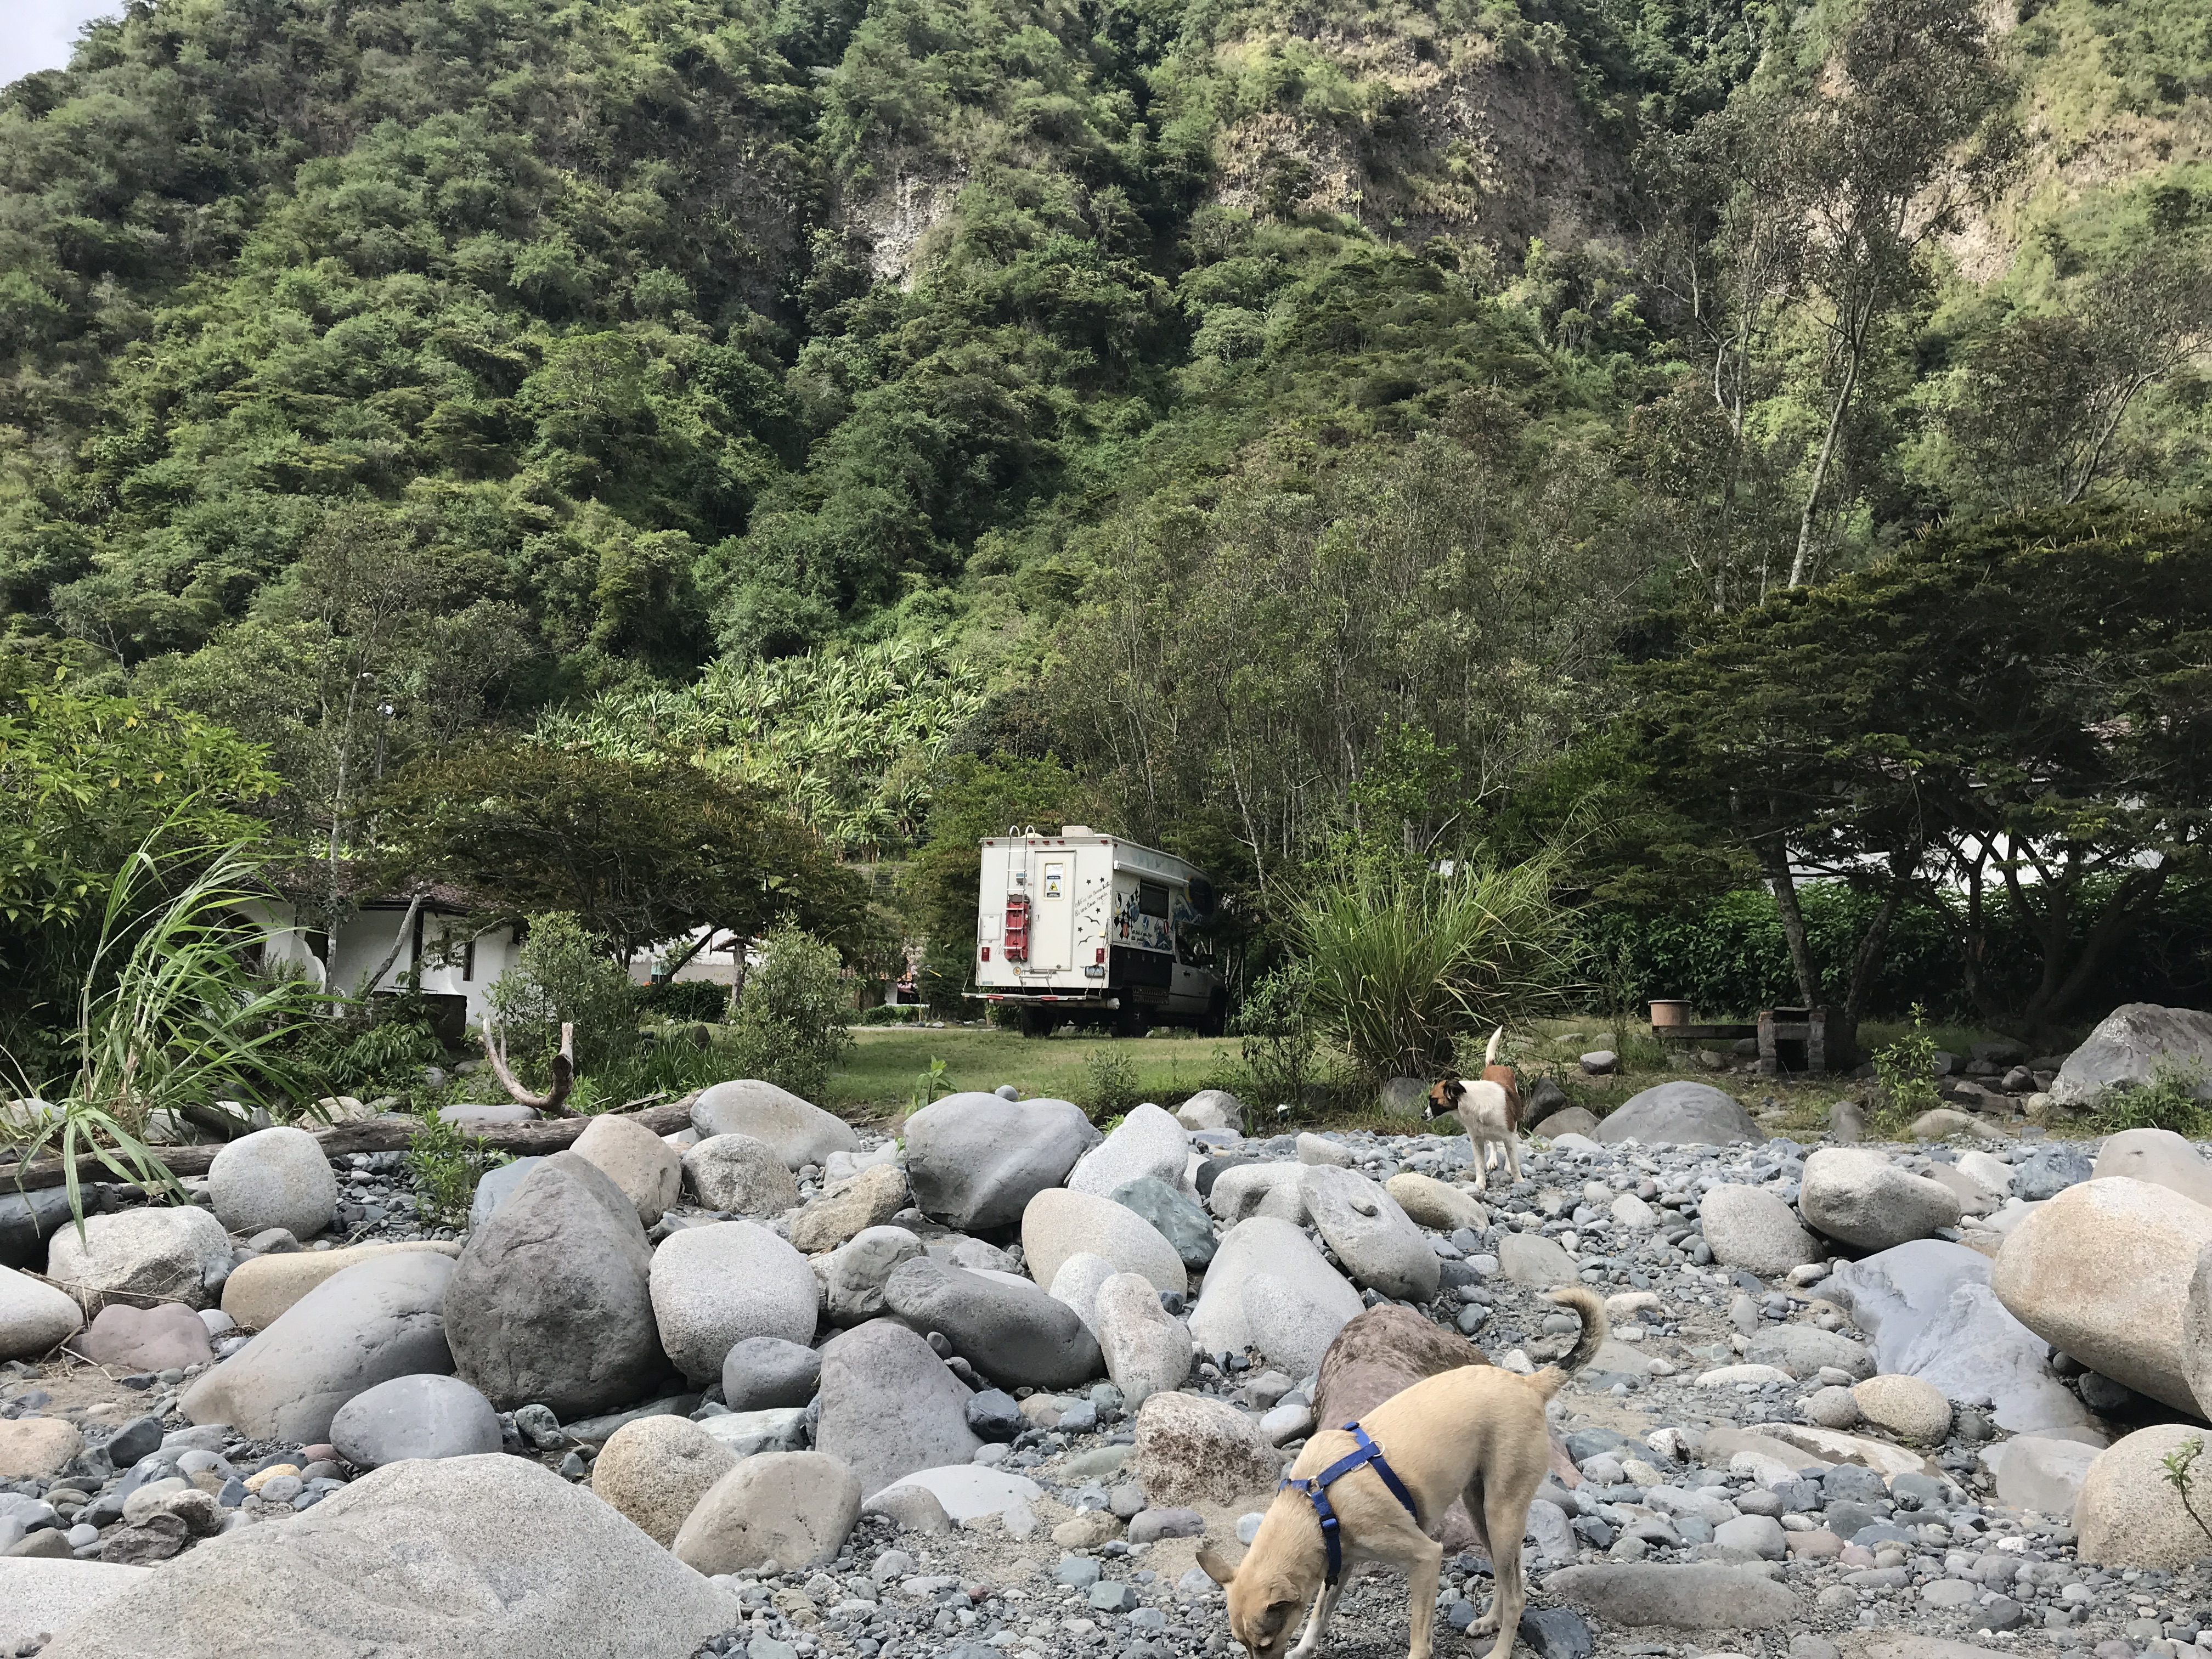 riverside campsite.JPG